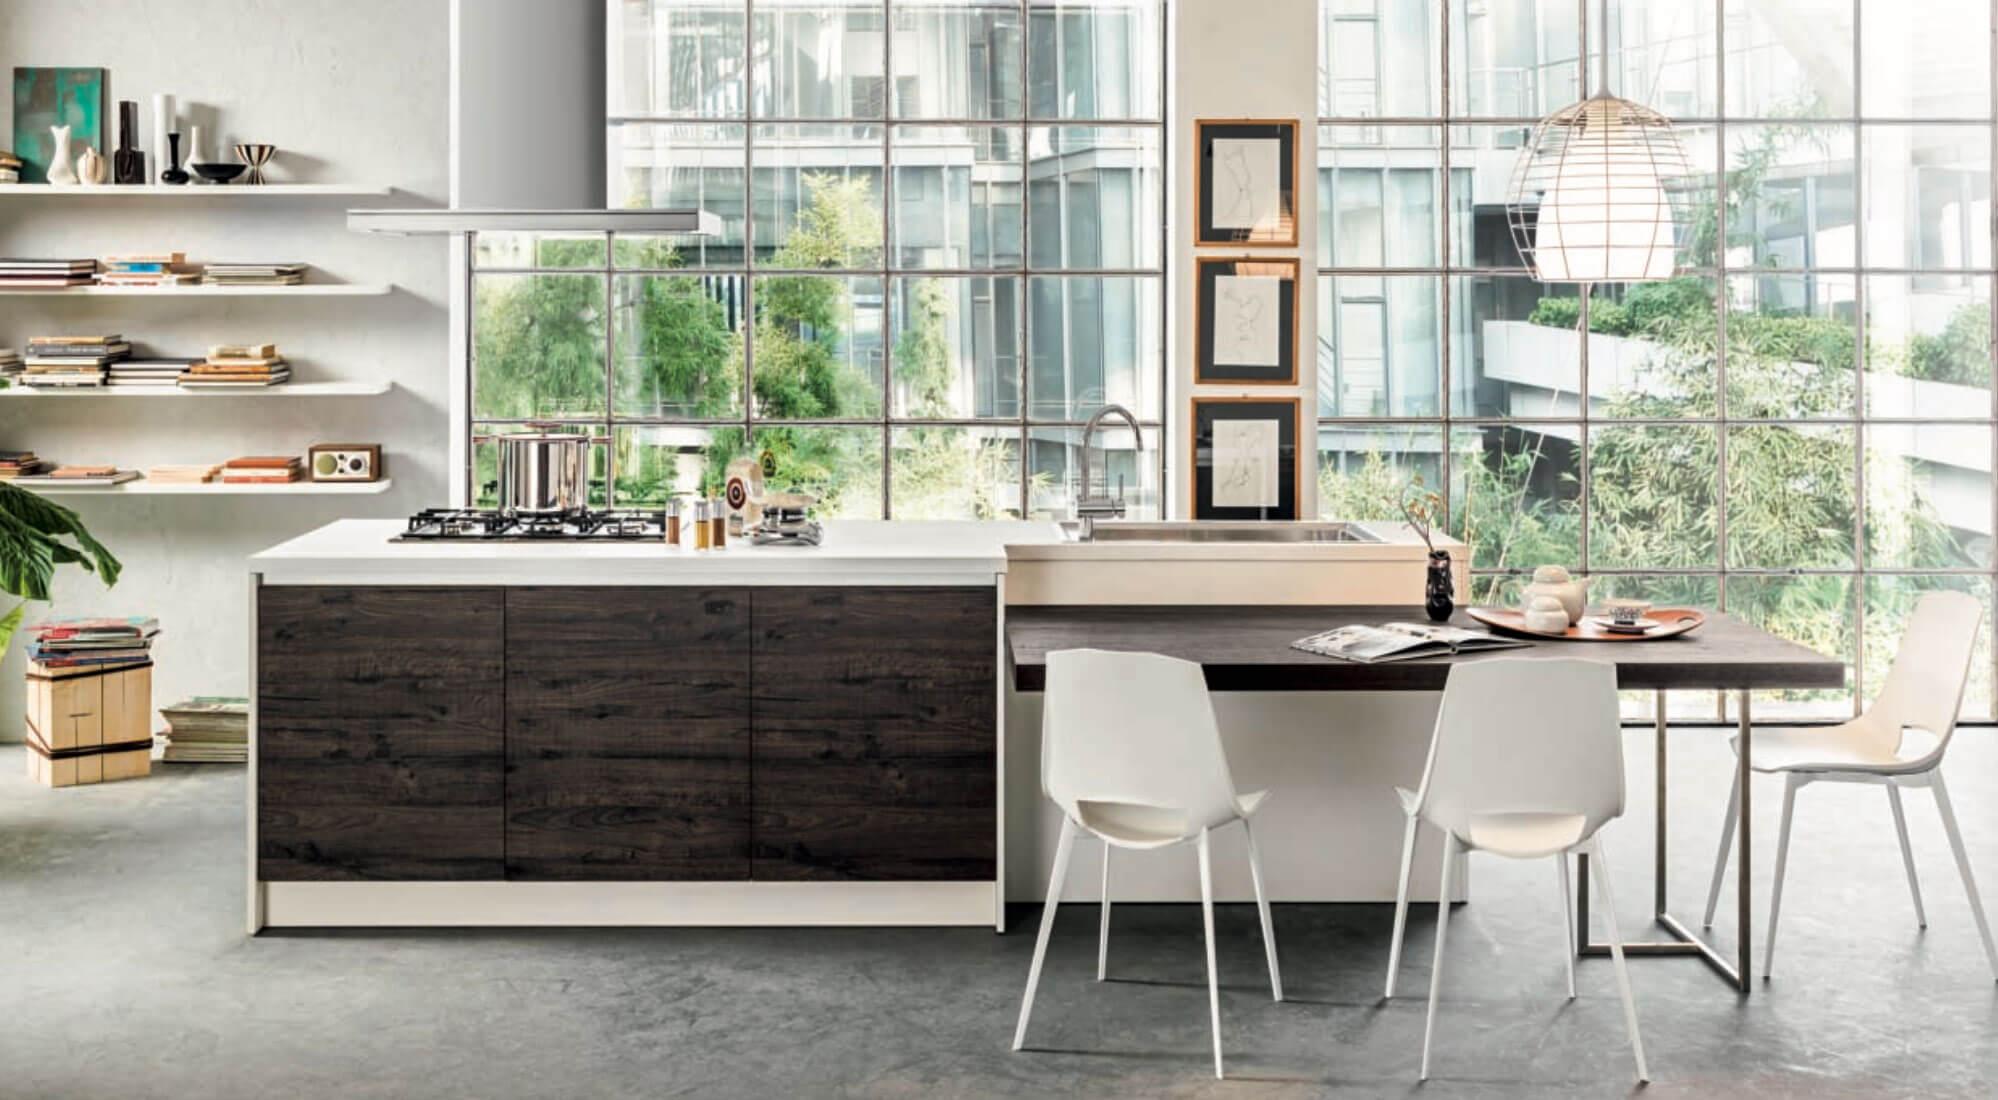 Componi la tua cucina affordable pavart realizza ambienti - Realizza la tua cucina ...